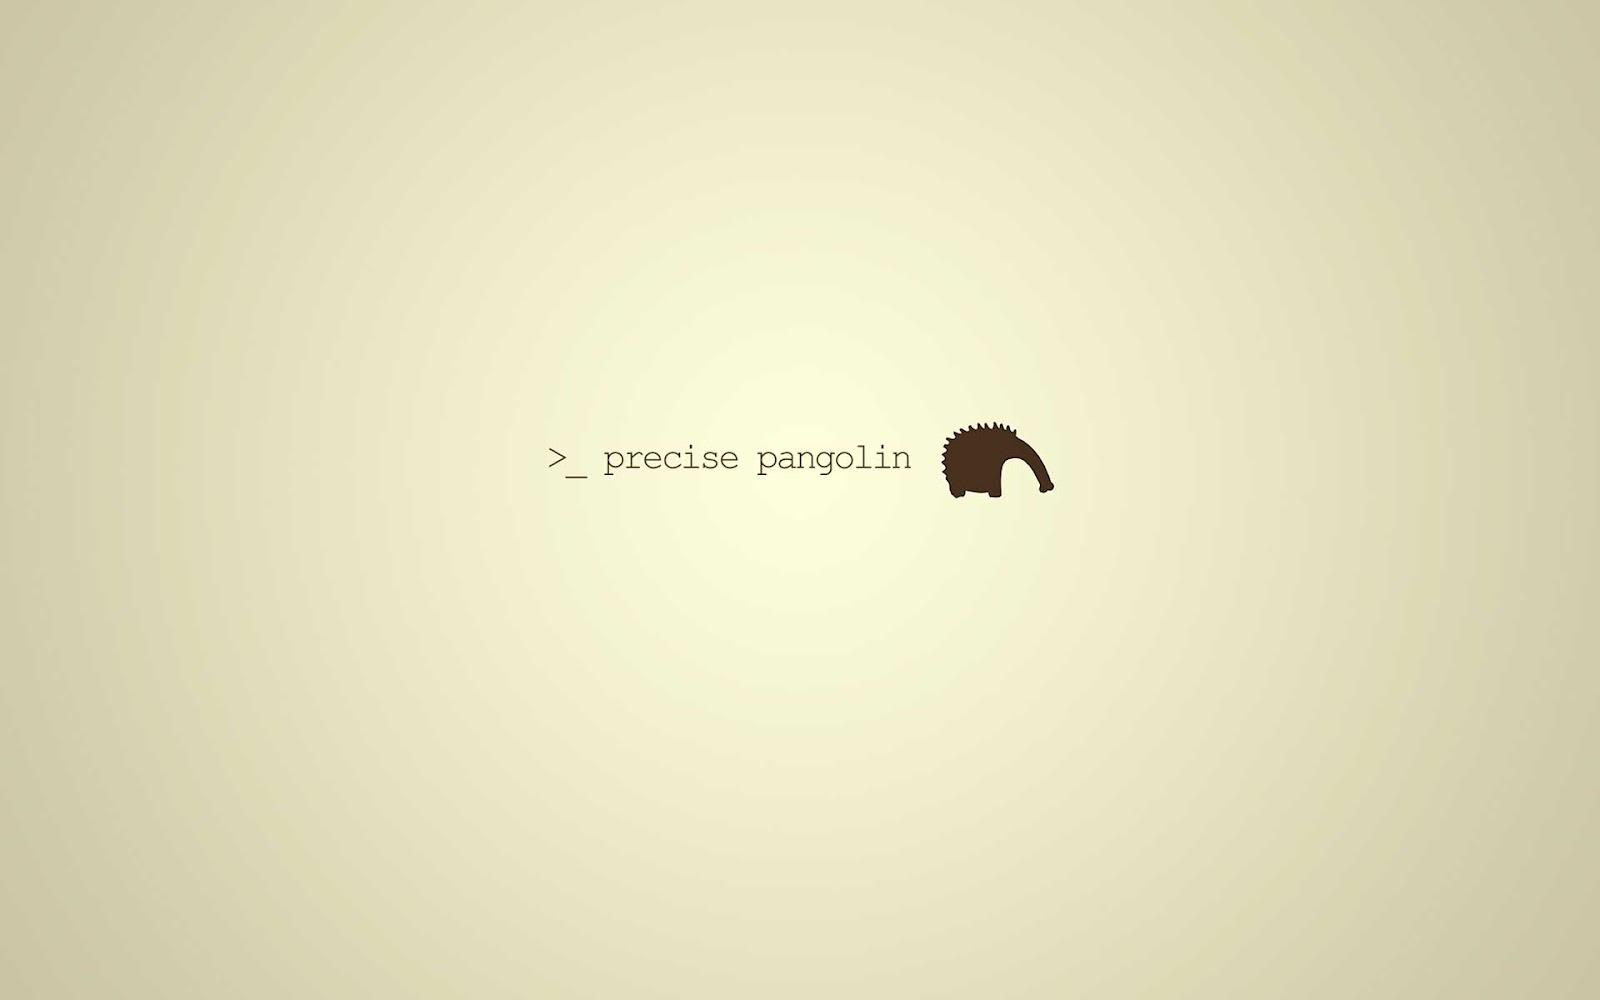 ubuntu precise pangolin wallpaper - photo #28